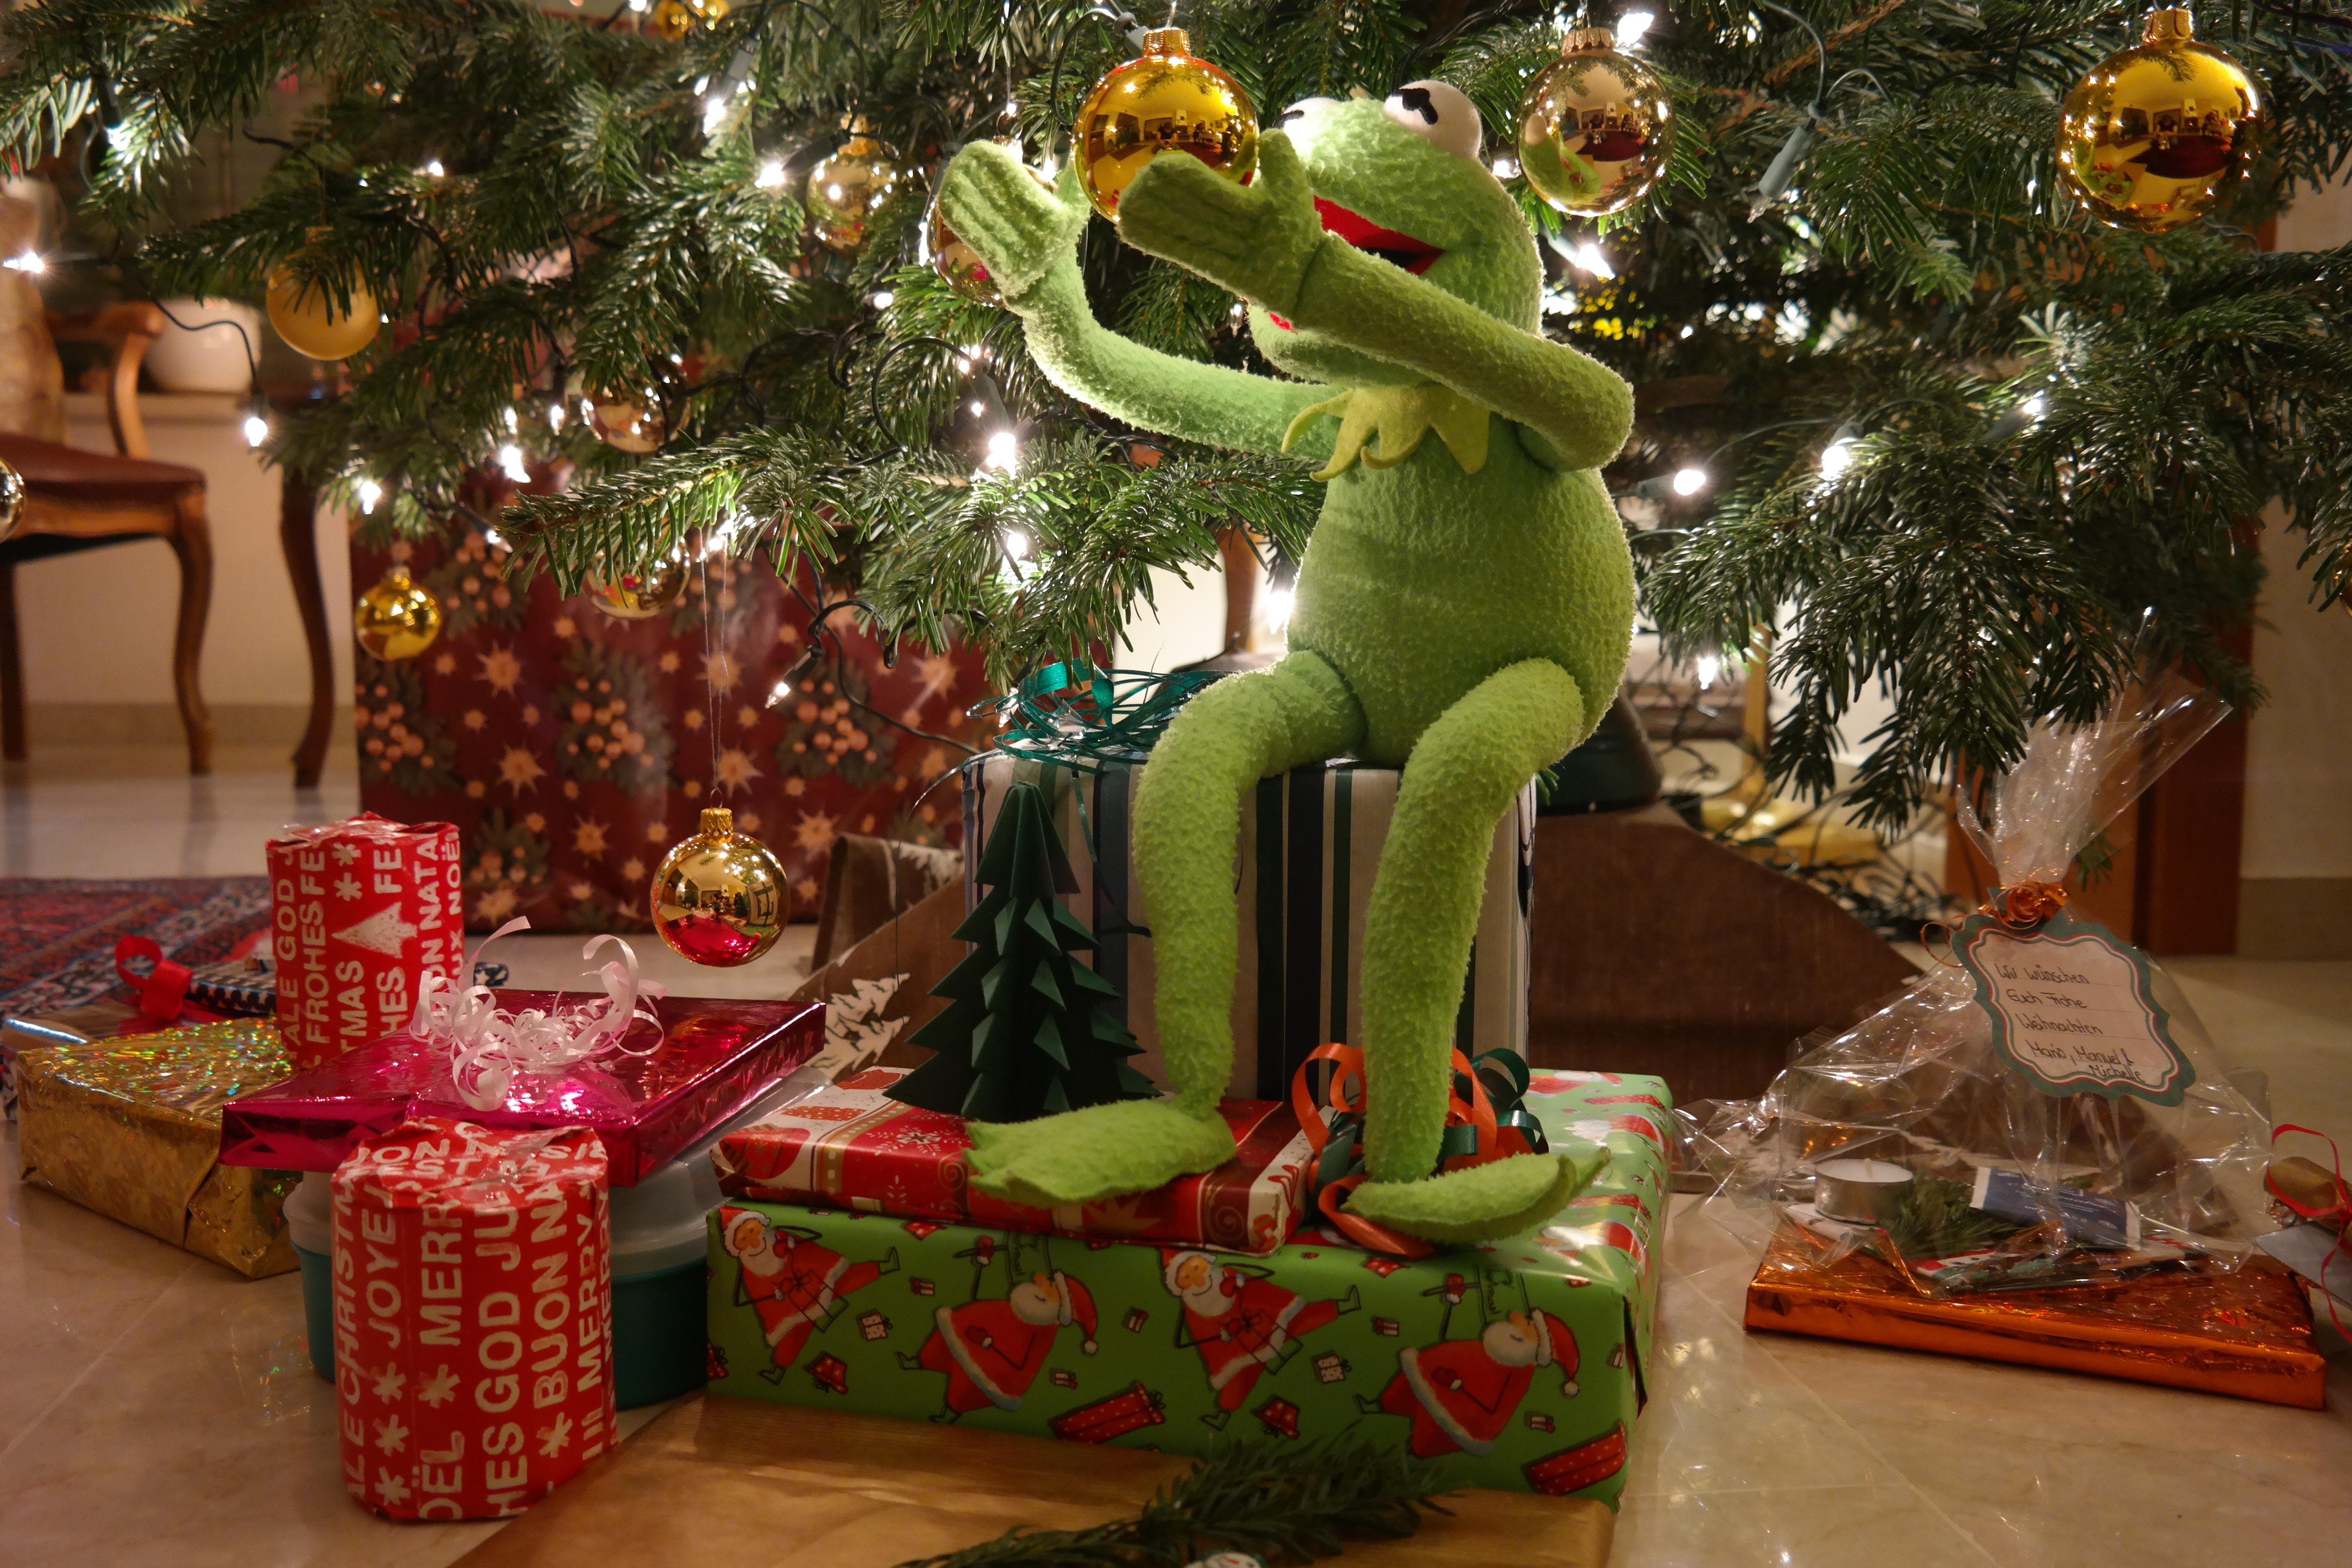 Kermit the frog under christmas tree free image